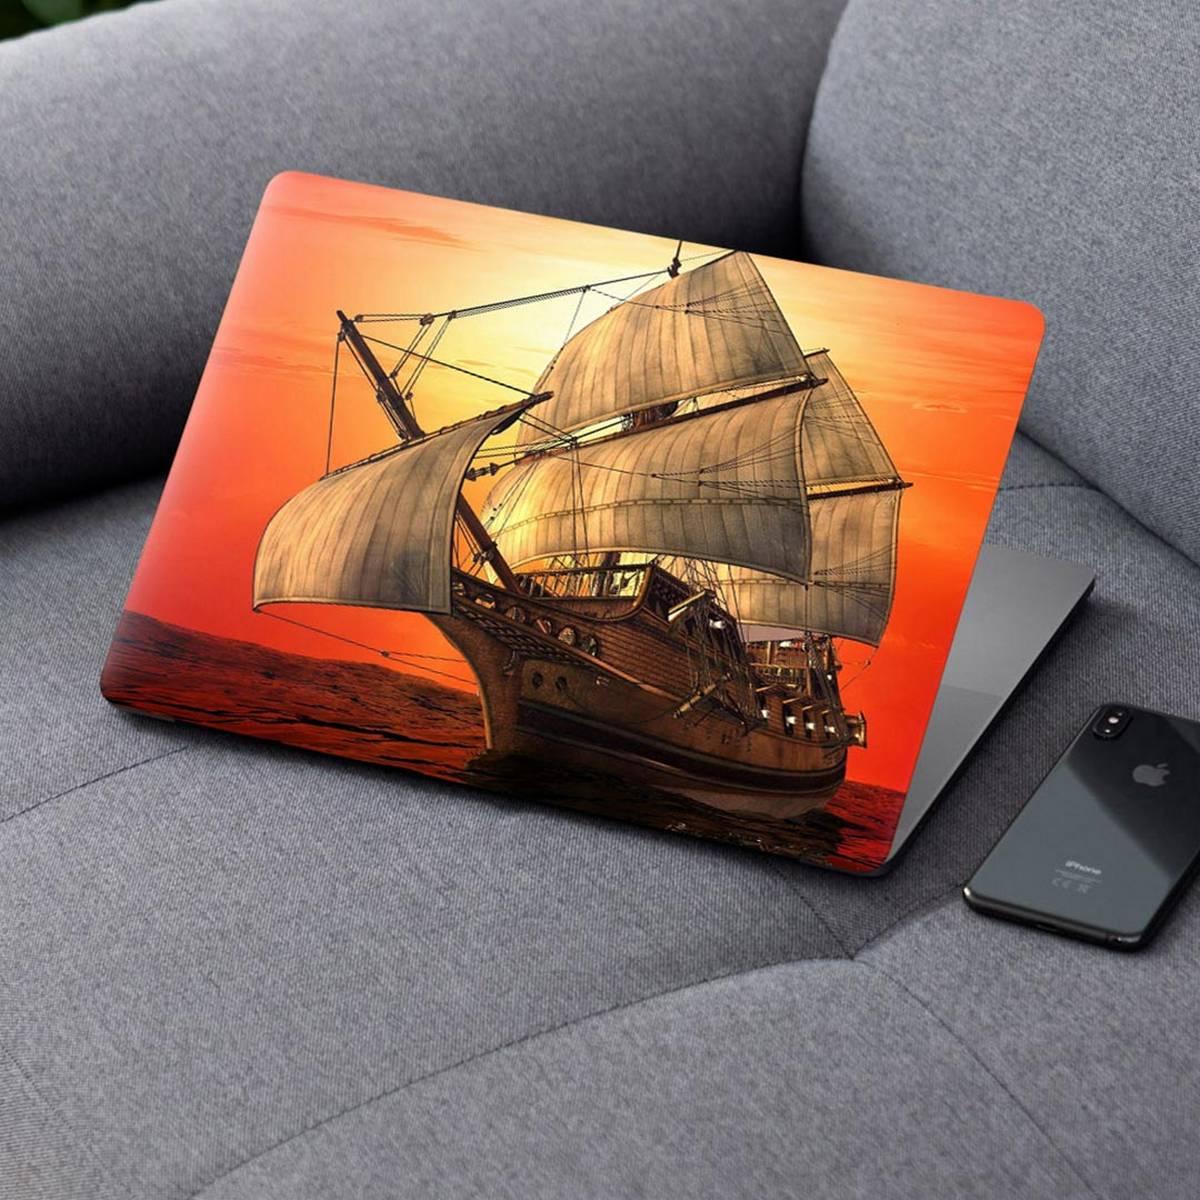 Universal Laptop Back Skin-Laptop Skin Vinyl Sticker Decal Protectors, 13 13.3 14.6 15 15.4 15.6 inch Laptop Skin Sticker Cover For All Laptops